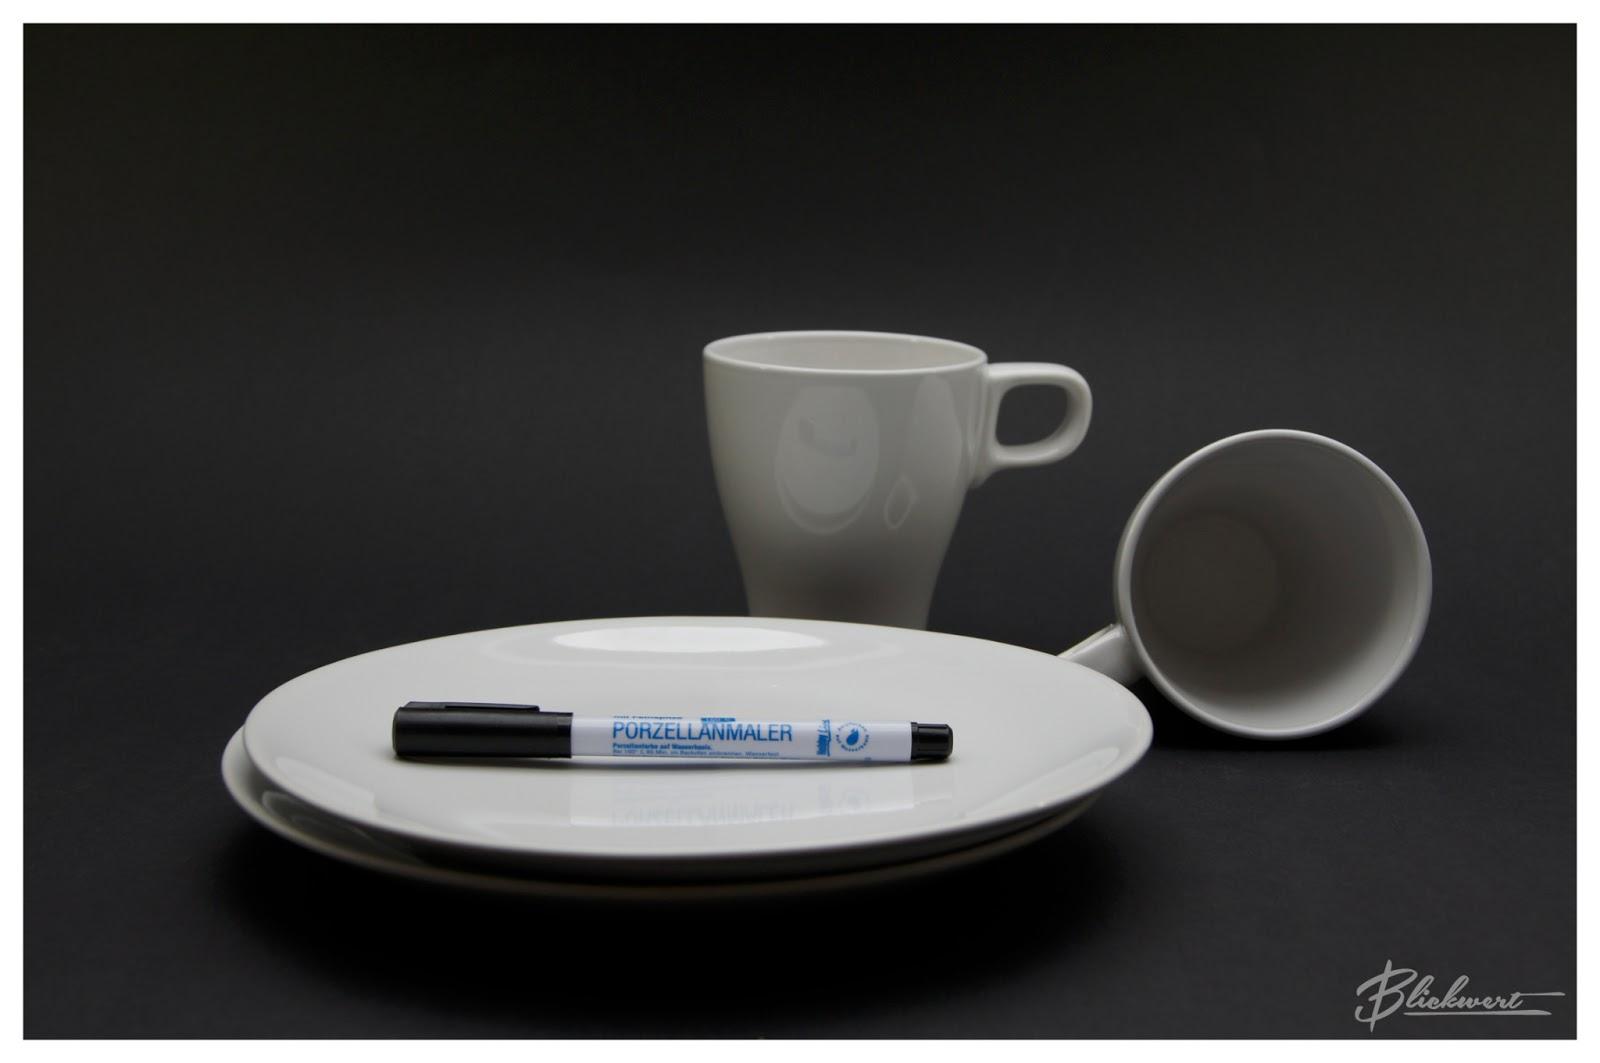 Blickwert: Pimp my dishes!